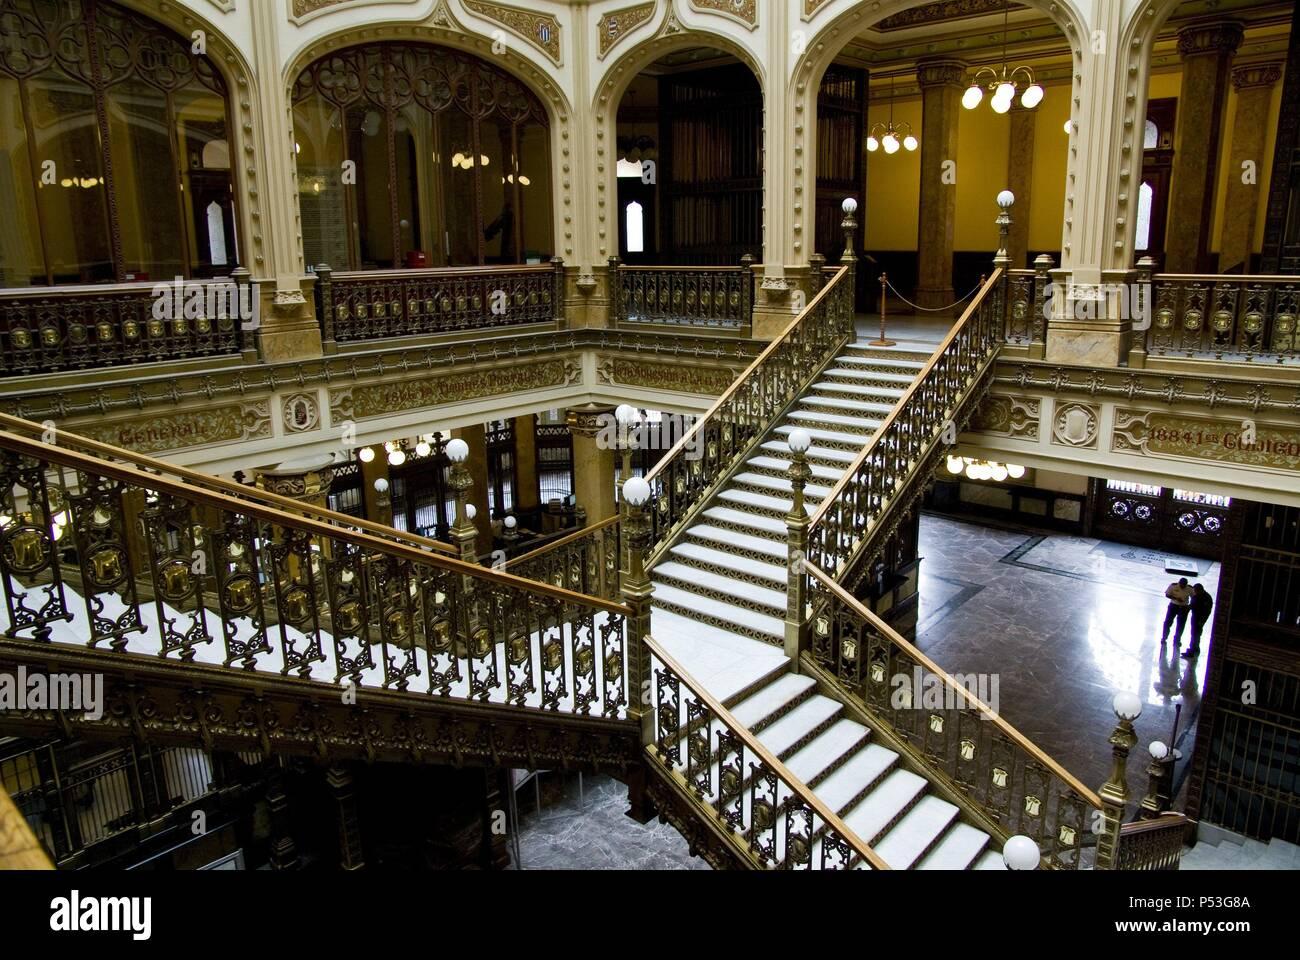 Mexico.Mexico city .Postal Palace (1907) work of Porfiriato.Italian architec Adamo Boari and mexican architec Gonzalez Garita.. - Stock Image